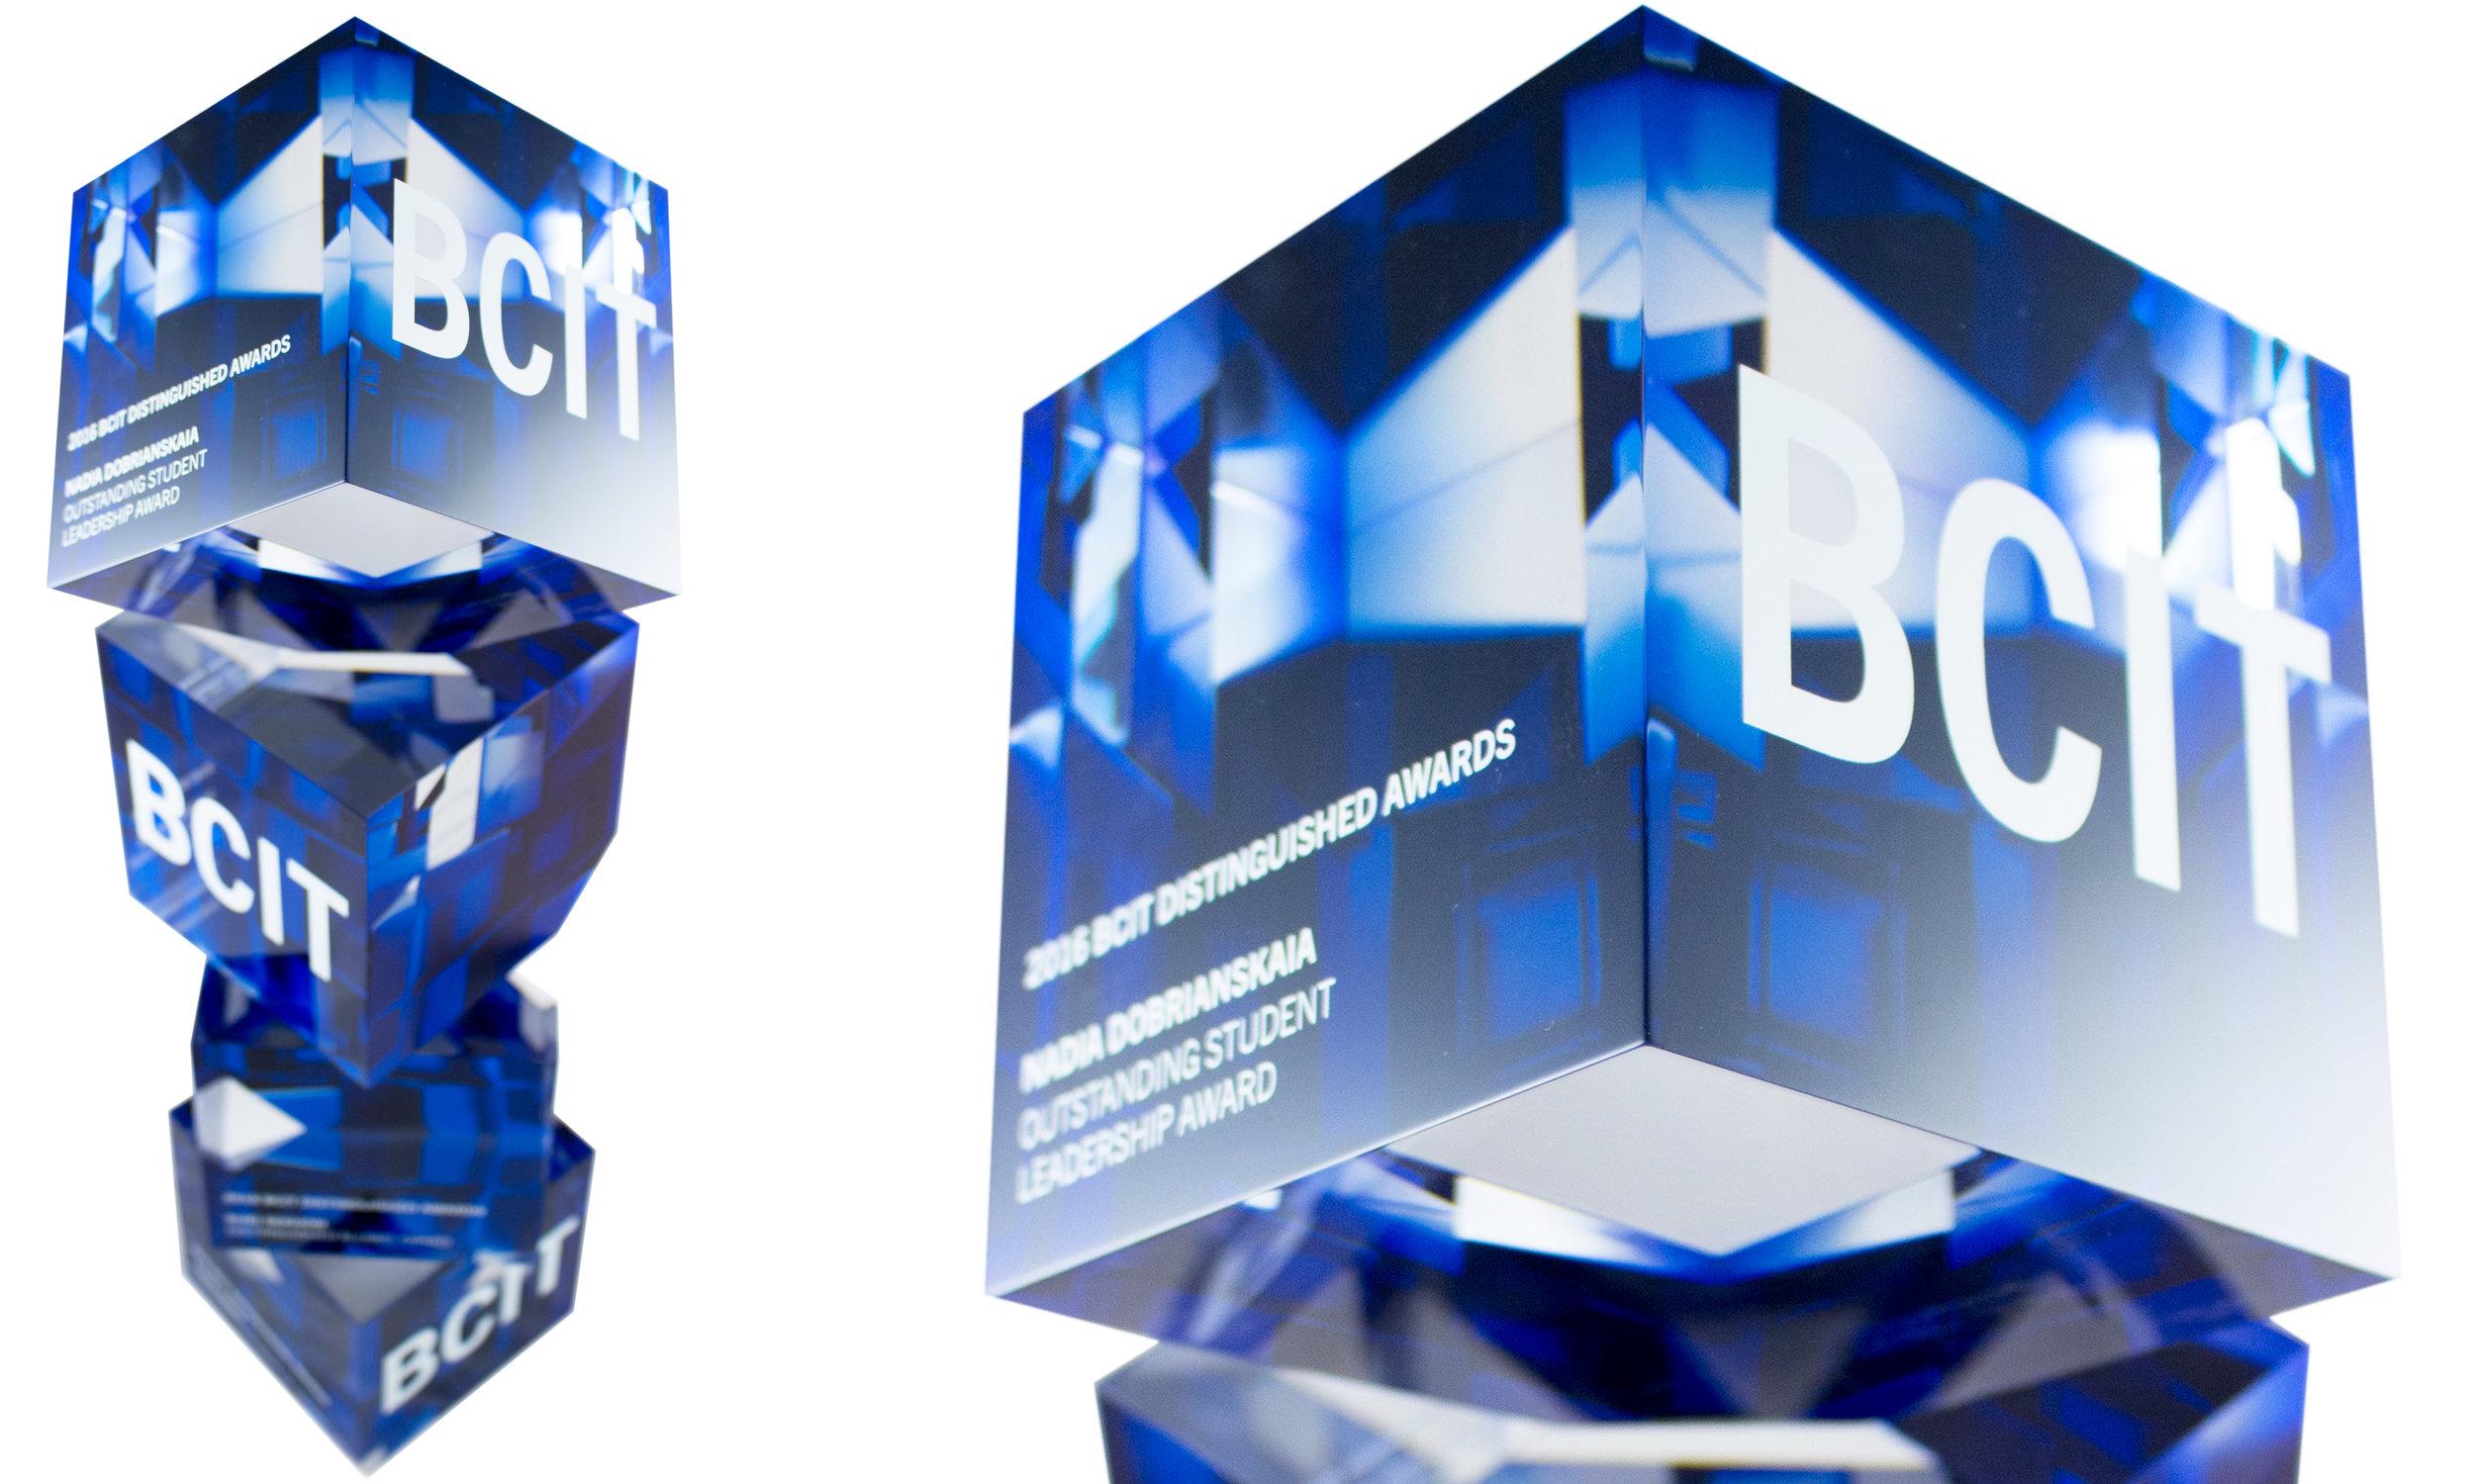 plaques, trophies, custom trophies, trophy, trophy and awards, trophy plaque, custom awards, glass trophy, trophy awards, hockey trophy, trophies and awards, awards trophies